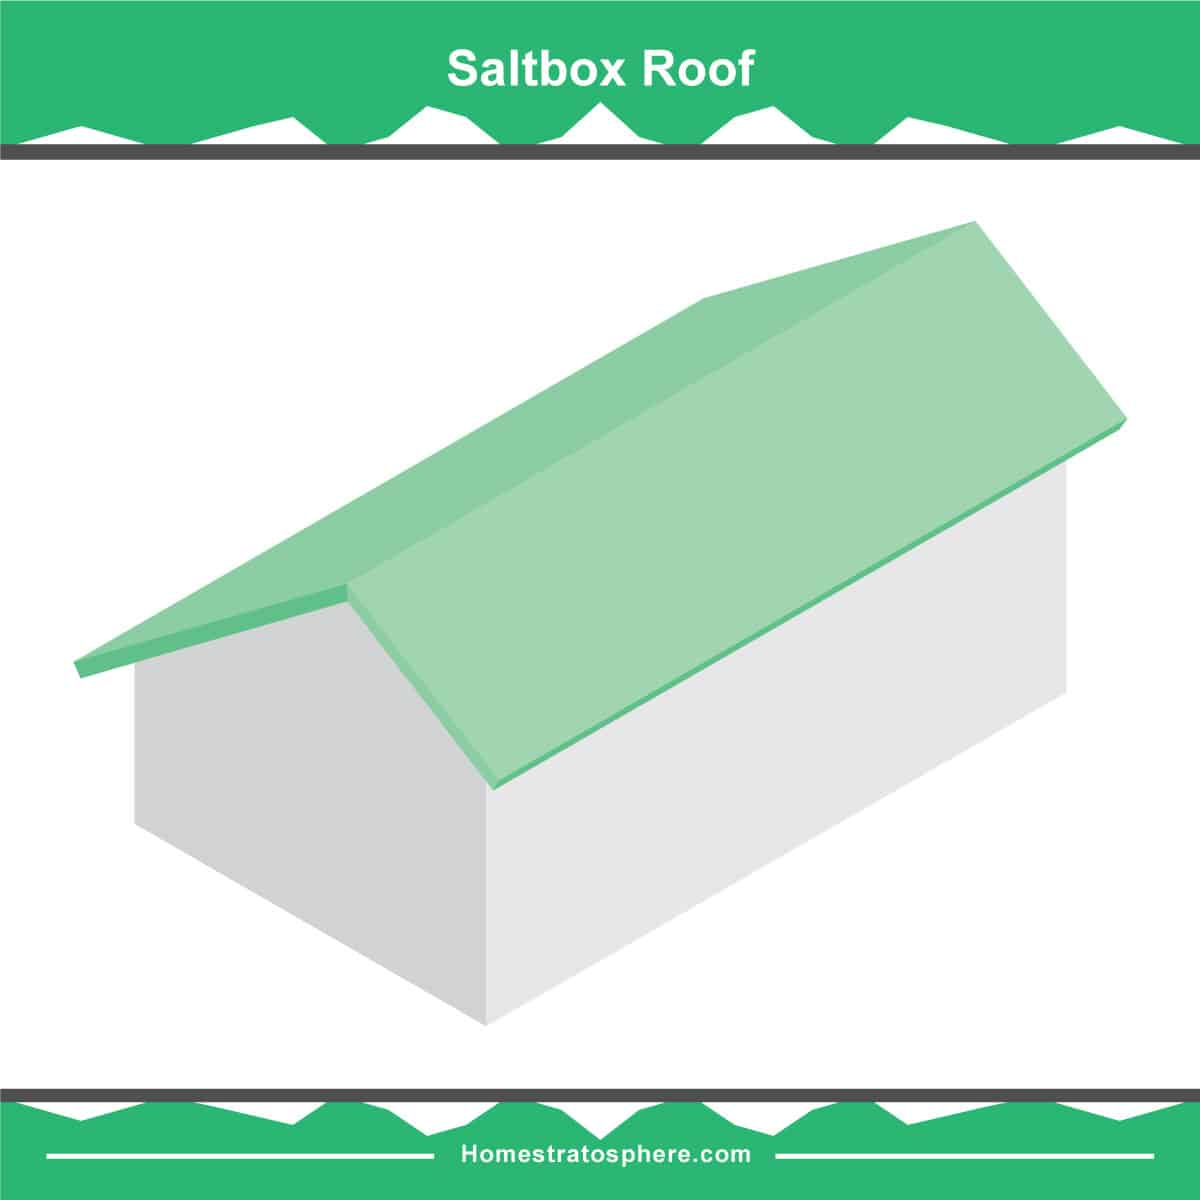 Saltbox roof diagram